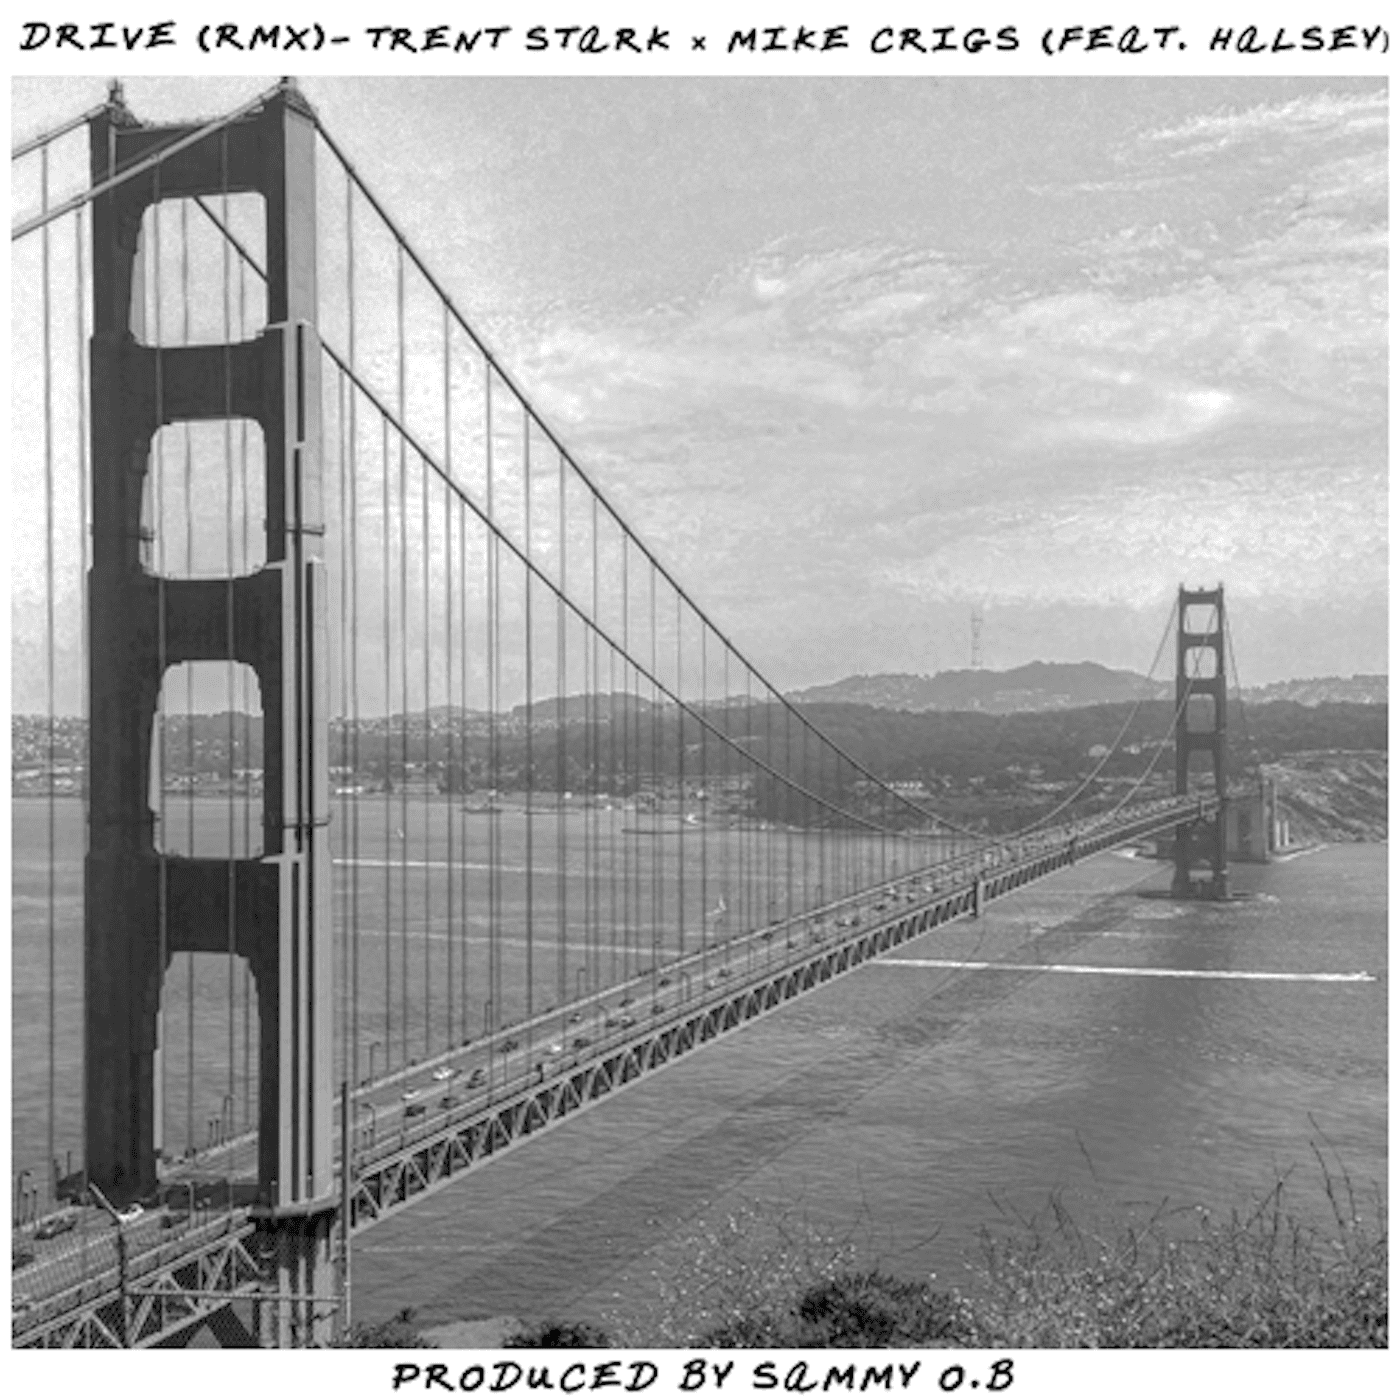 Trent Stark - Drive RMX Ft. Mike Crigs & Halsey